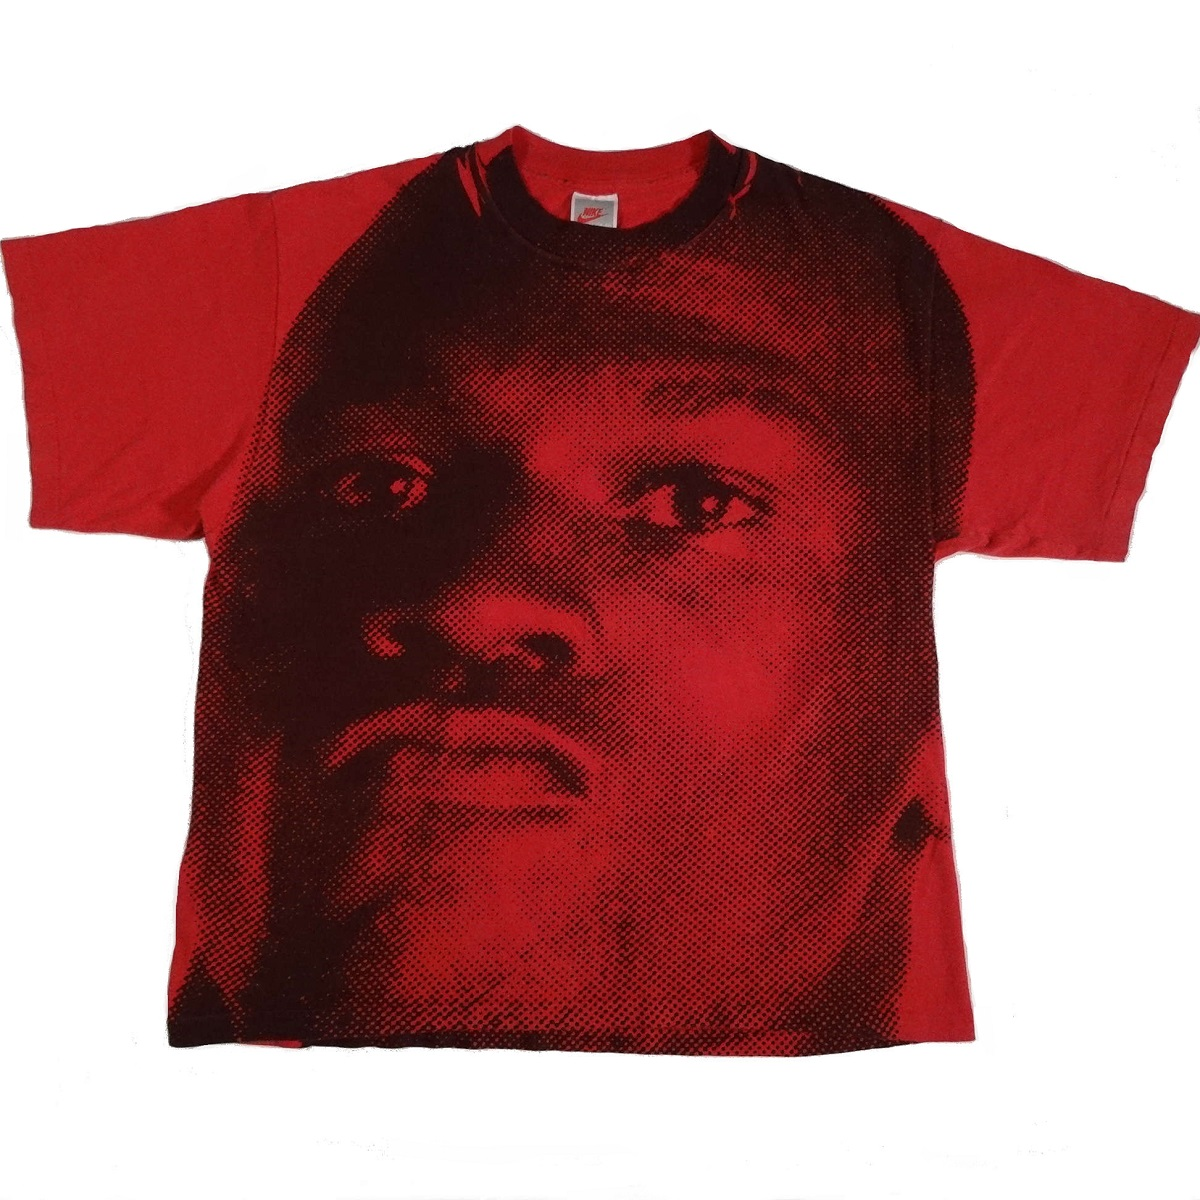 Vintage 90's Nike Air Jordan T Shirt image on front of shirt